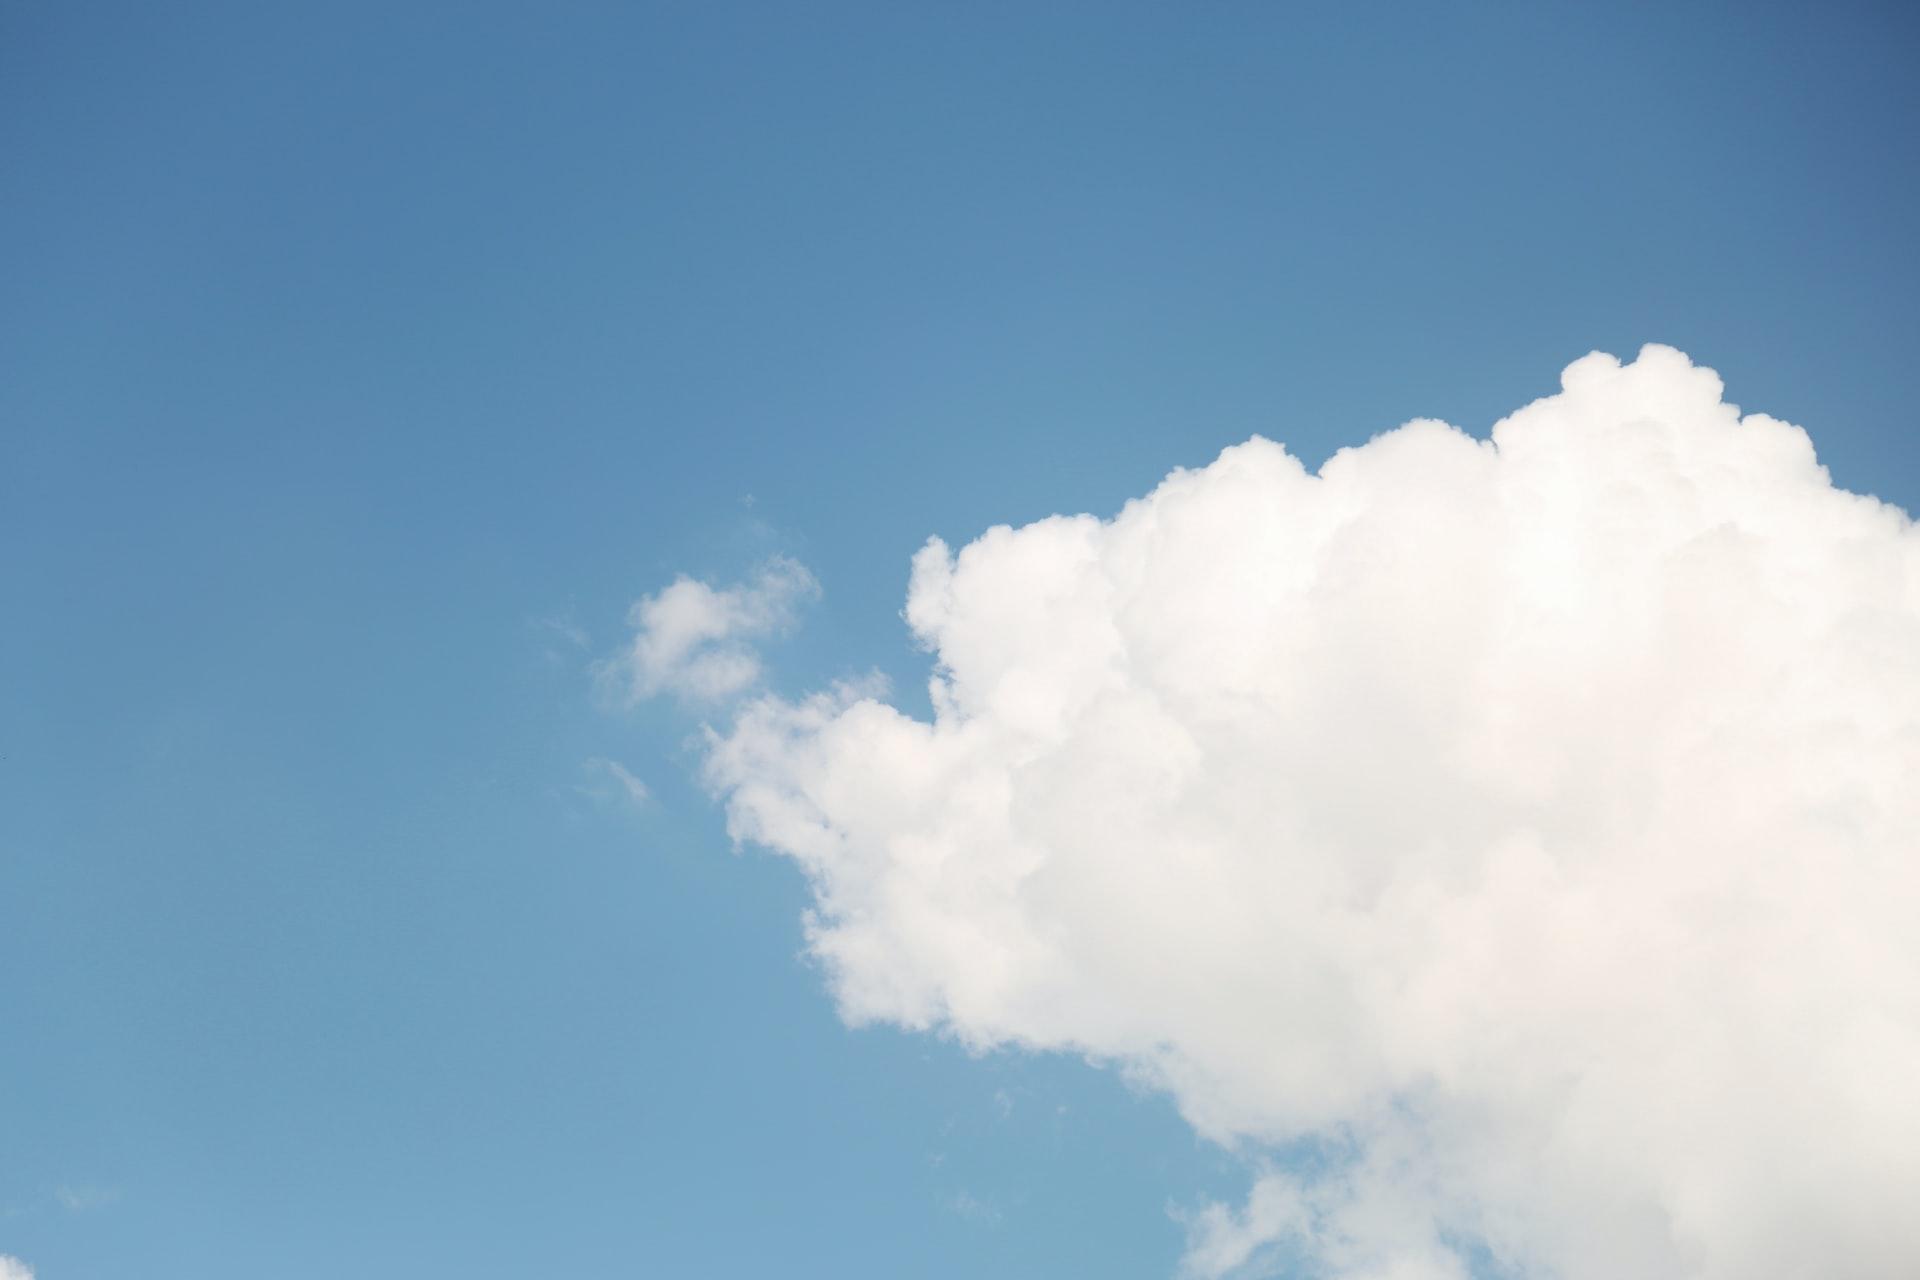 aziz ayad azure cloud